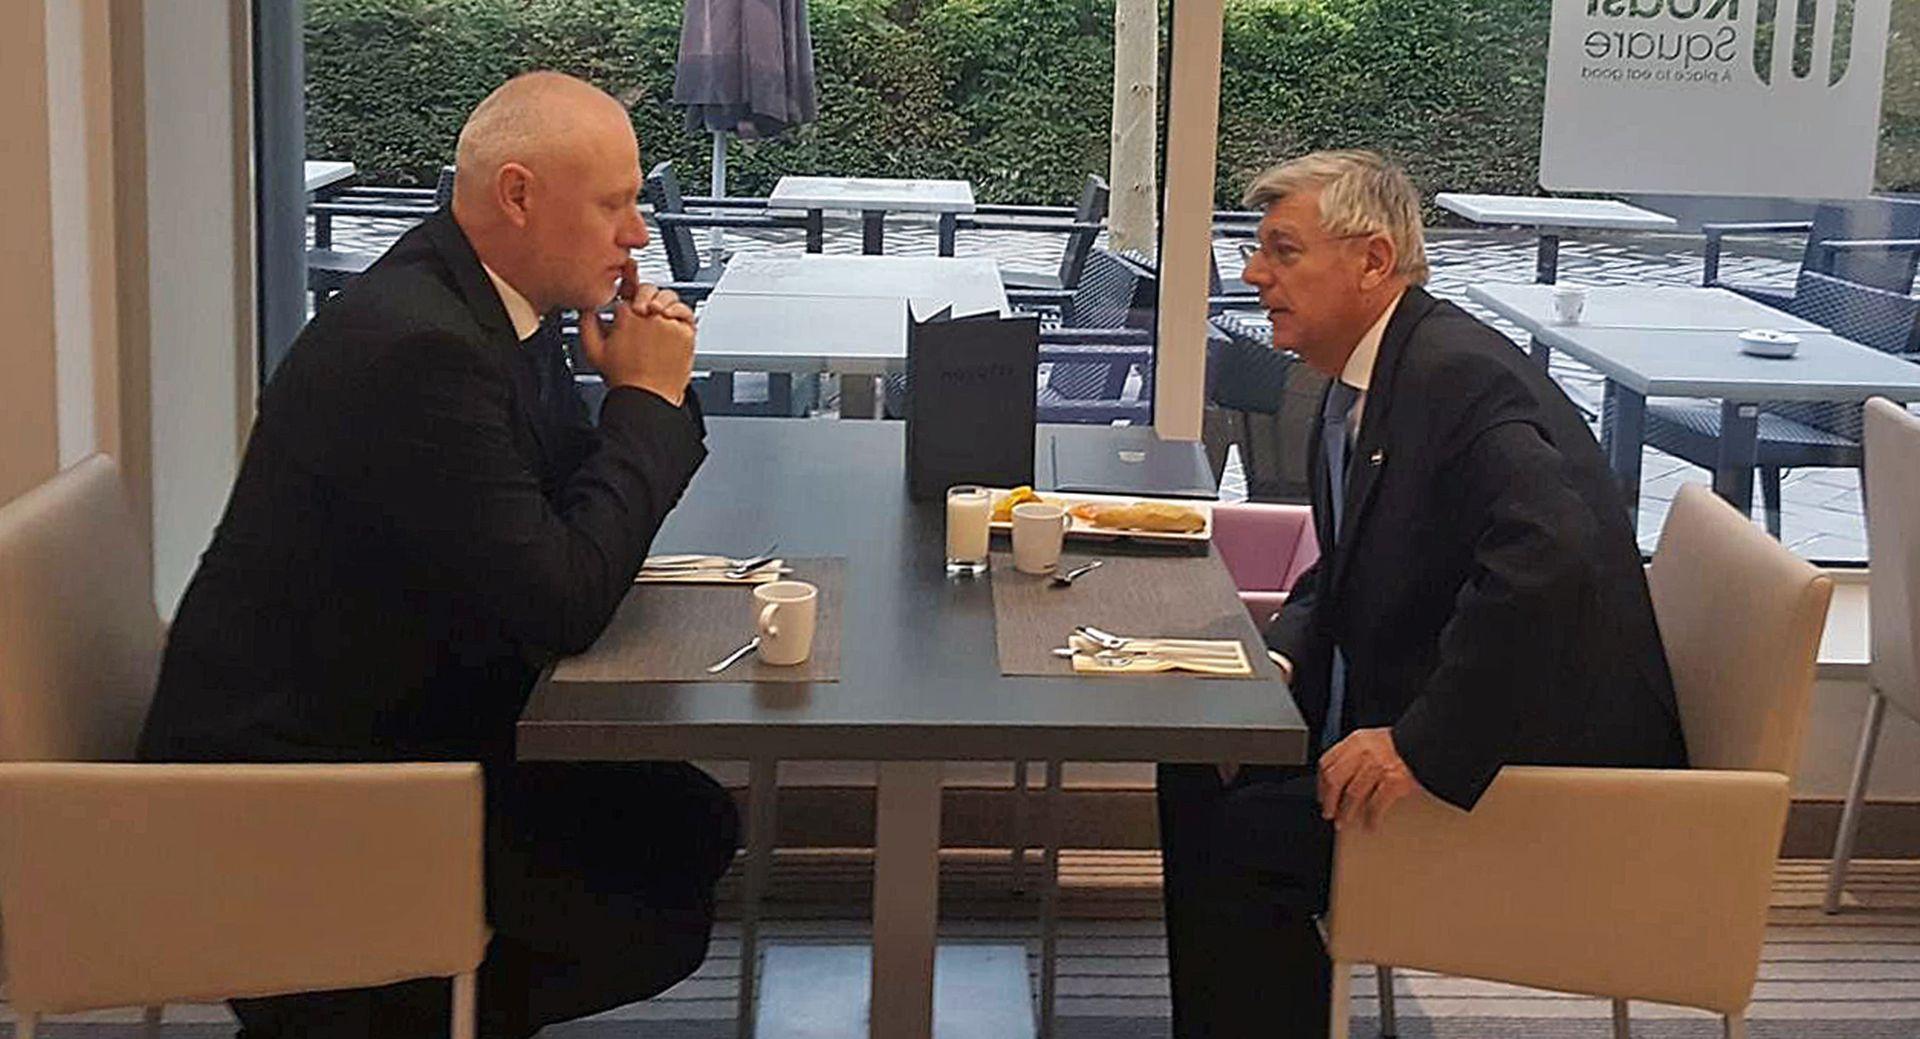 Reiner i Brglez: Hrvatsko-slovenske probleme rješavati sustavno